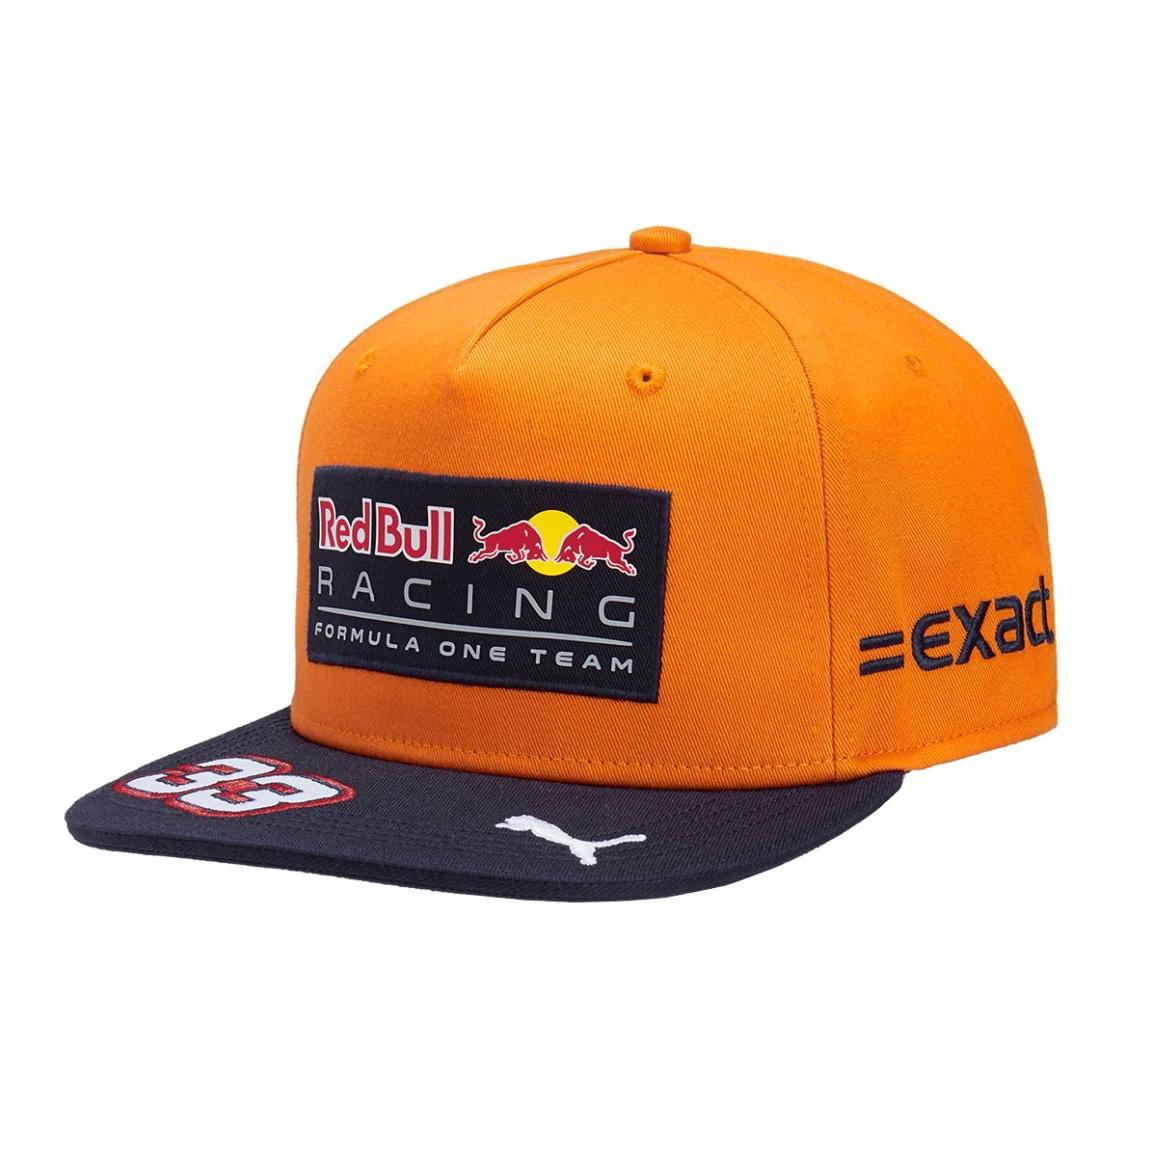 Aston Martin Red Bull Racing Branded